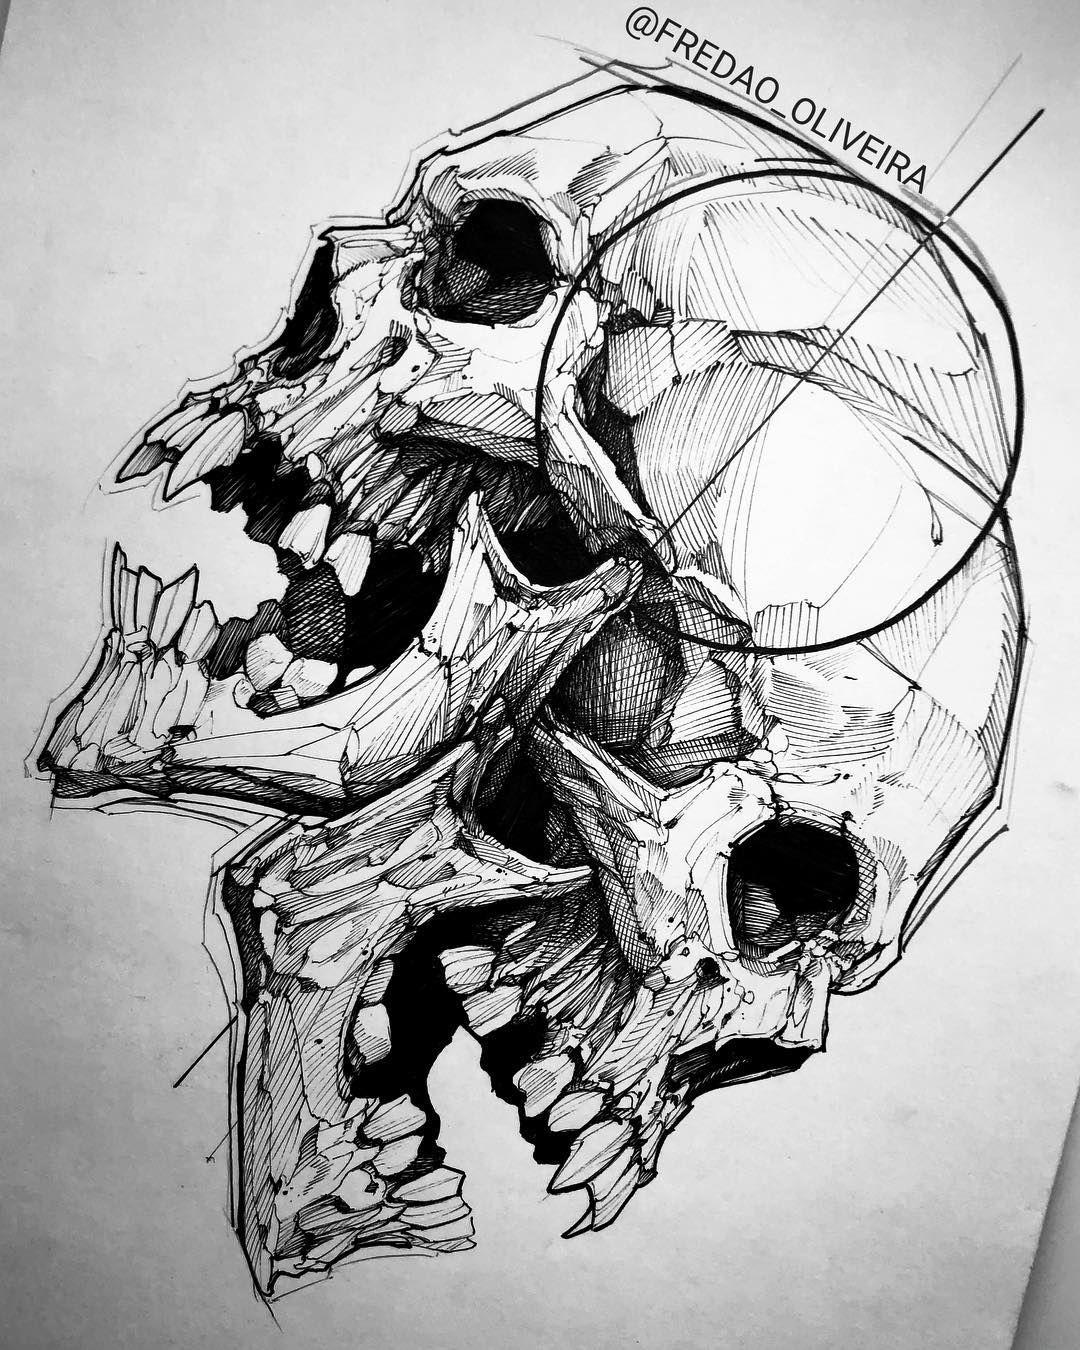 Skull Always Good To Practice Blackworkerssubmission Darkartists Btattooing Blac Skull Art Tattoo Design Drawings Skull Art Tattoo